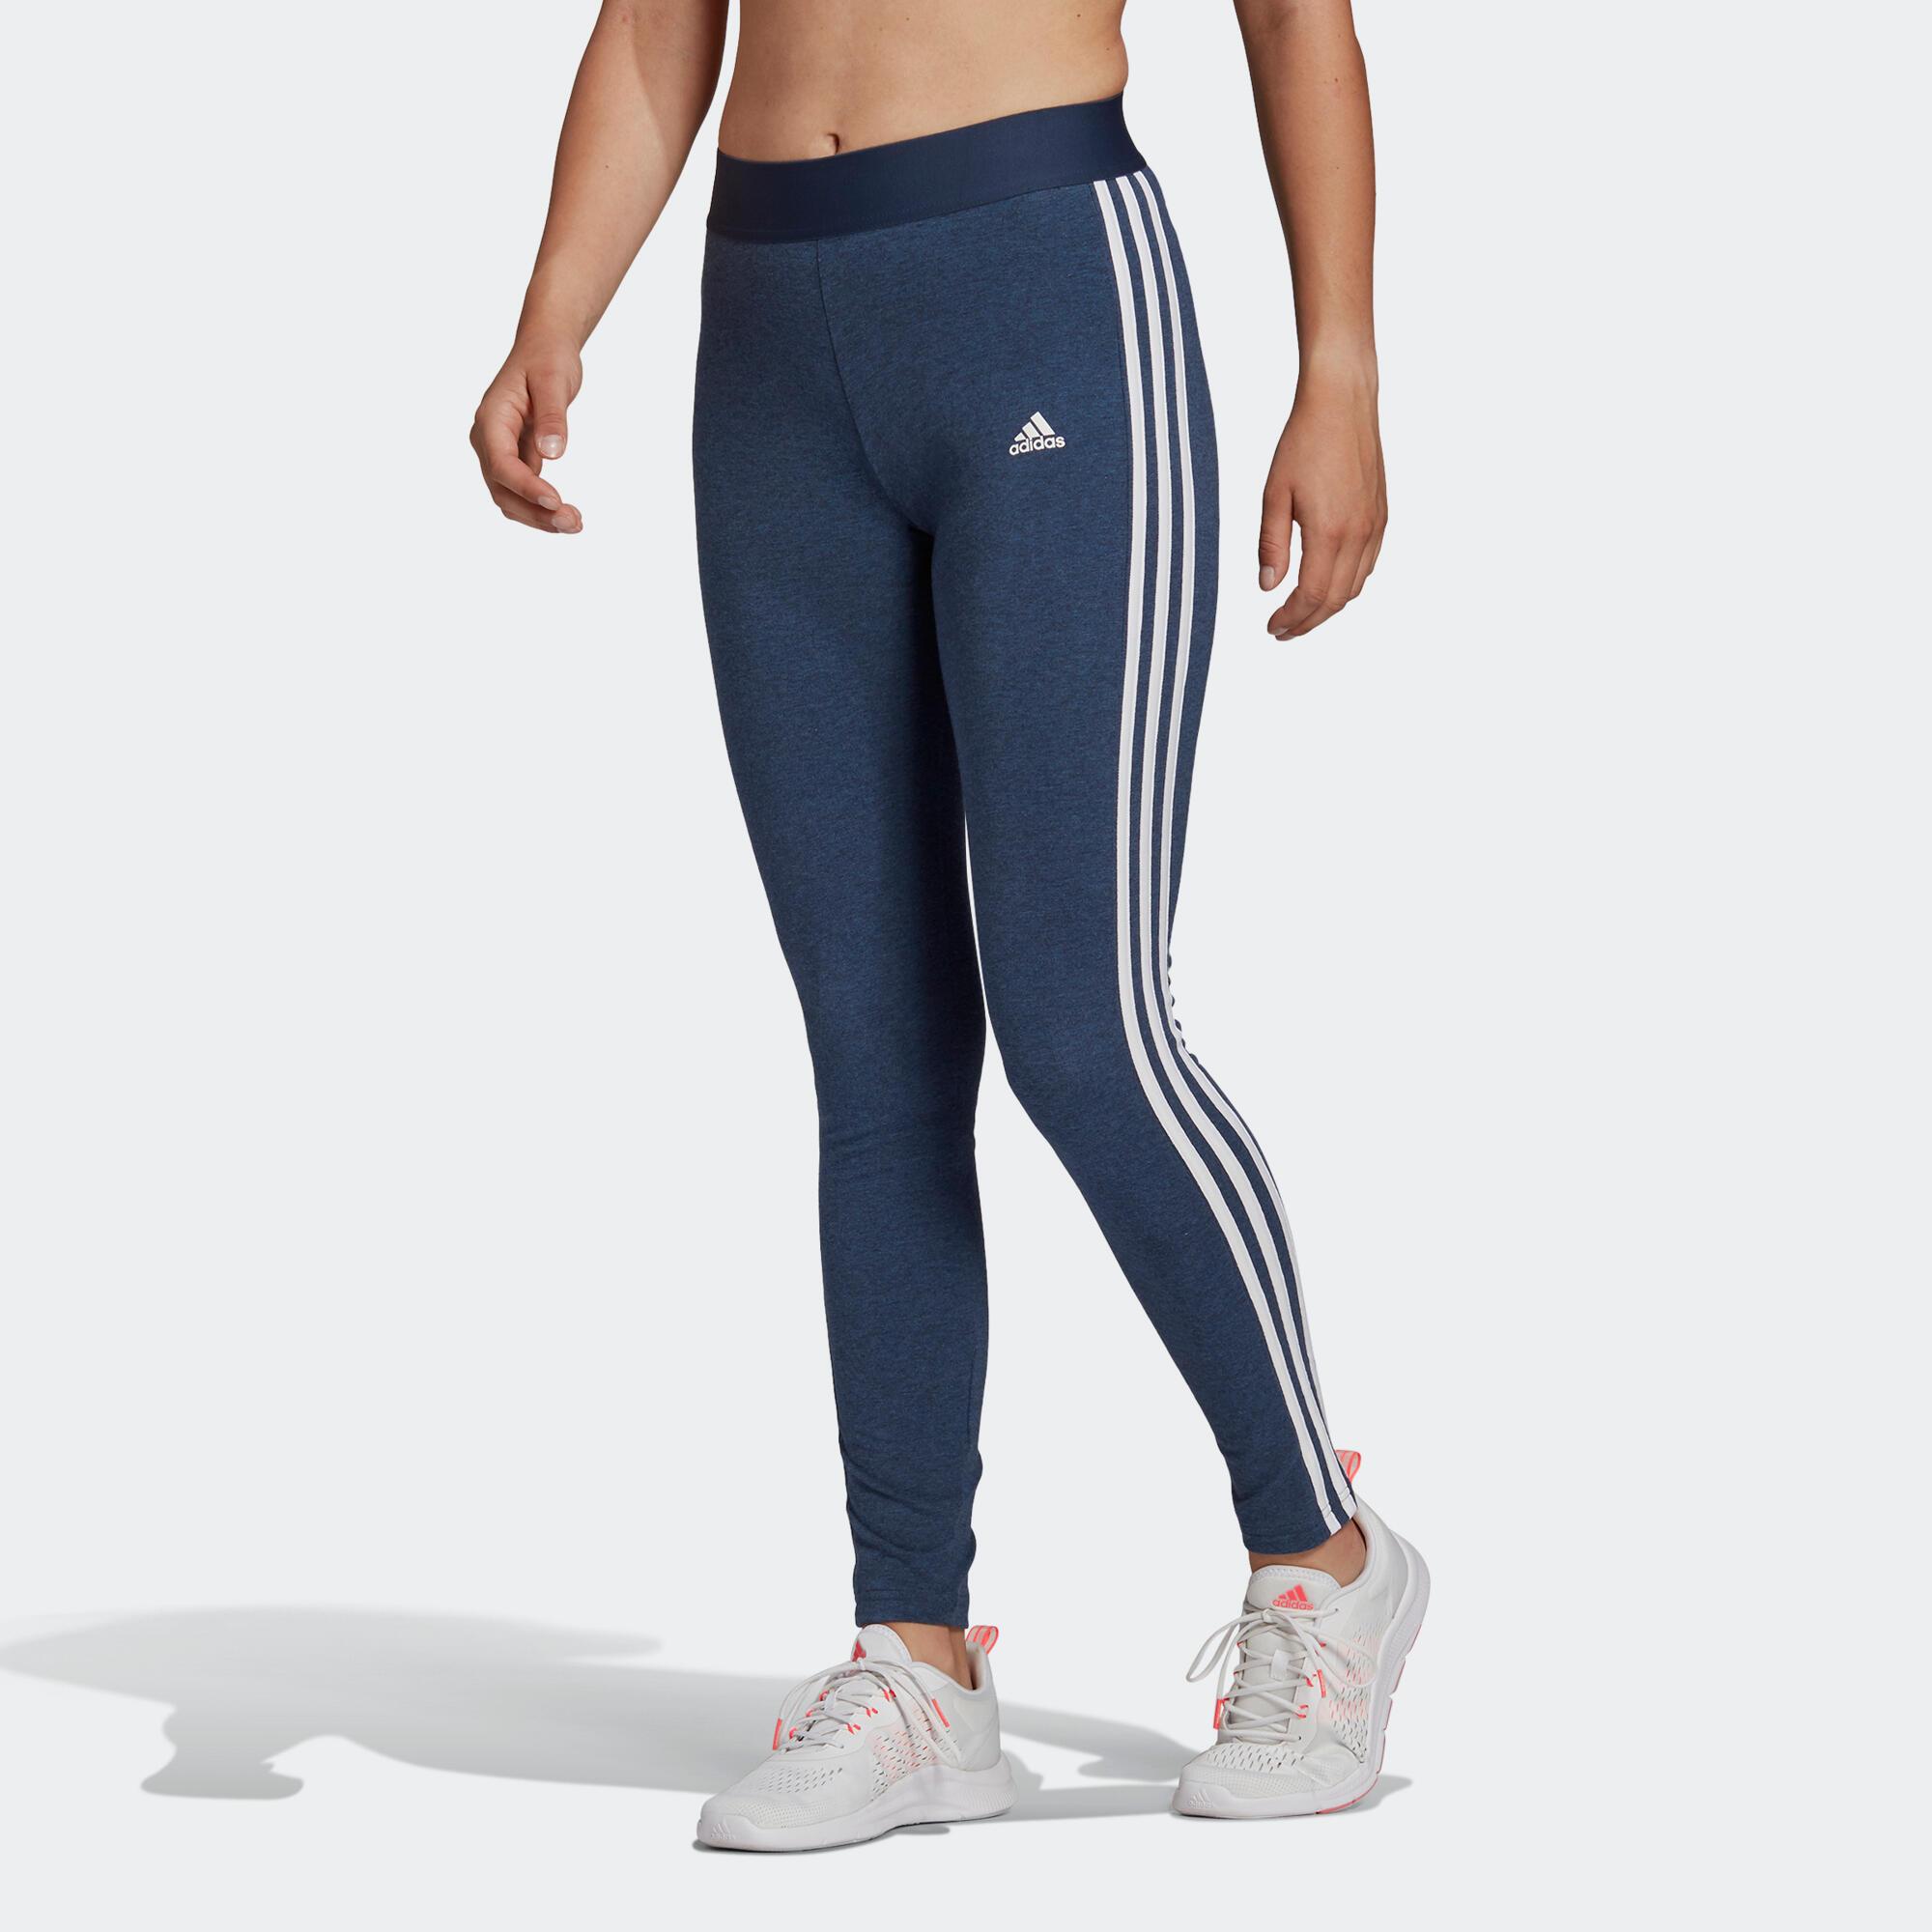 Adidas Leggings donna  3 stripes cotone blu melange e bianco